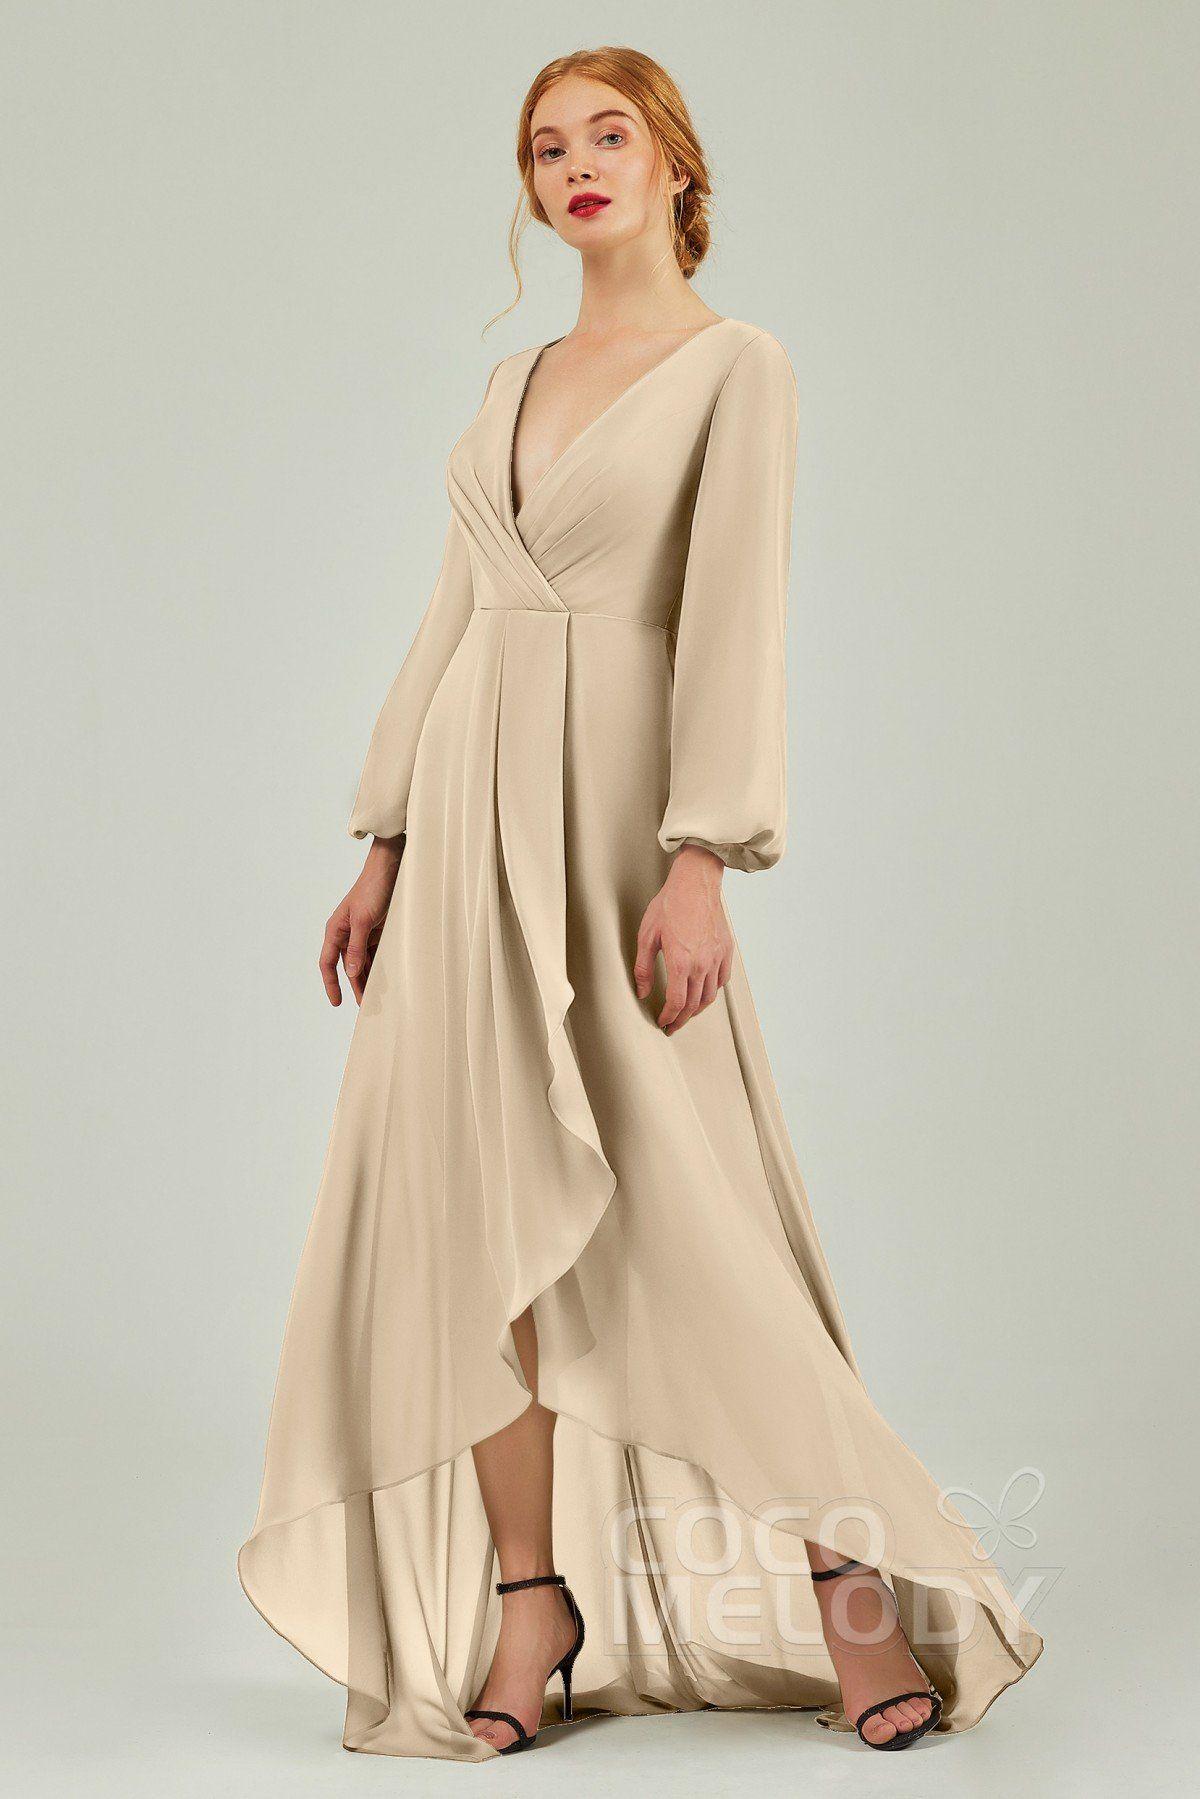 Usd 139 99 Asymmetrical Sweep Brush Long Sleeve Bridesmaid Dress Cb0239 Bridesmaid Dresses Brown Bridesmaid Dresses Long Sleeve Bridesmaid Dress [ 1799 x 1200 Pixel ]